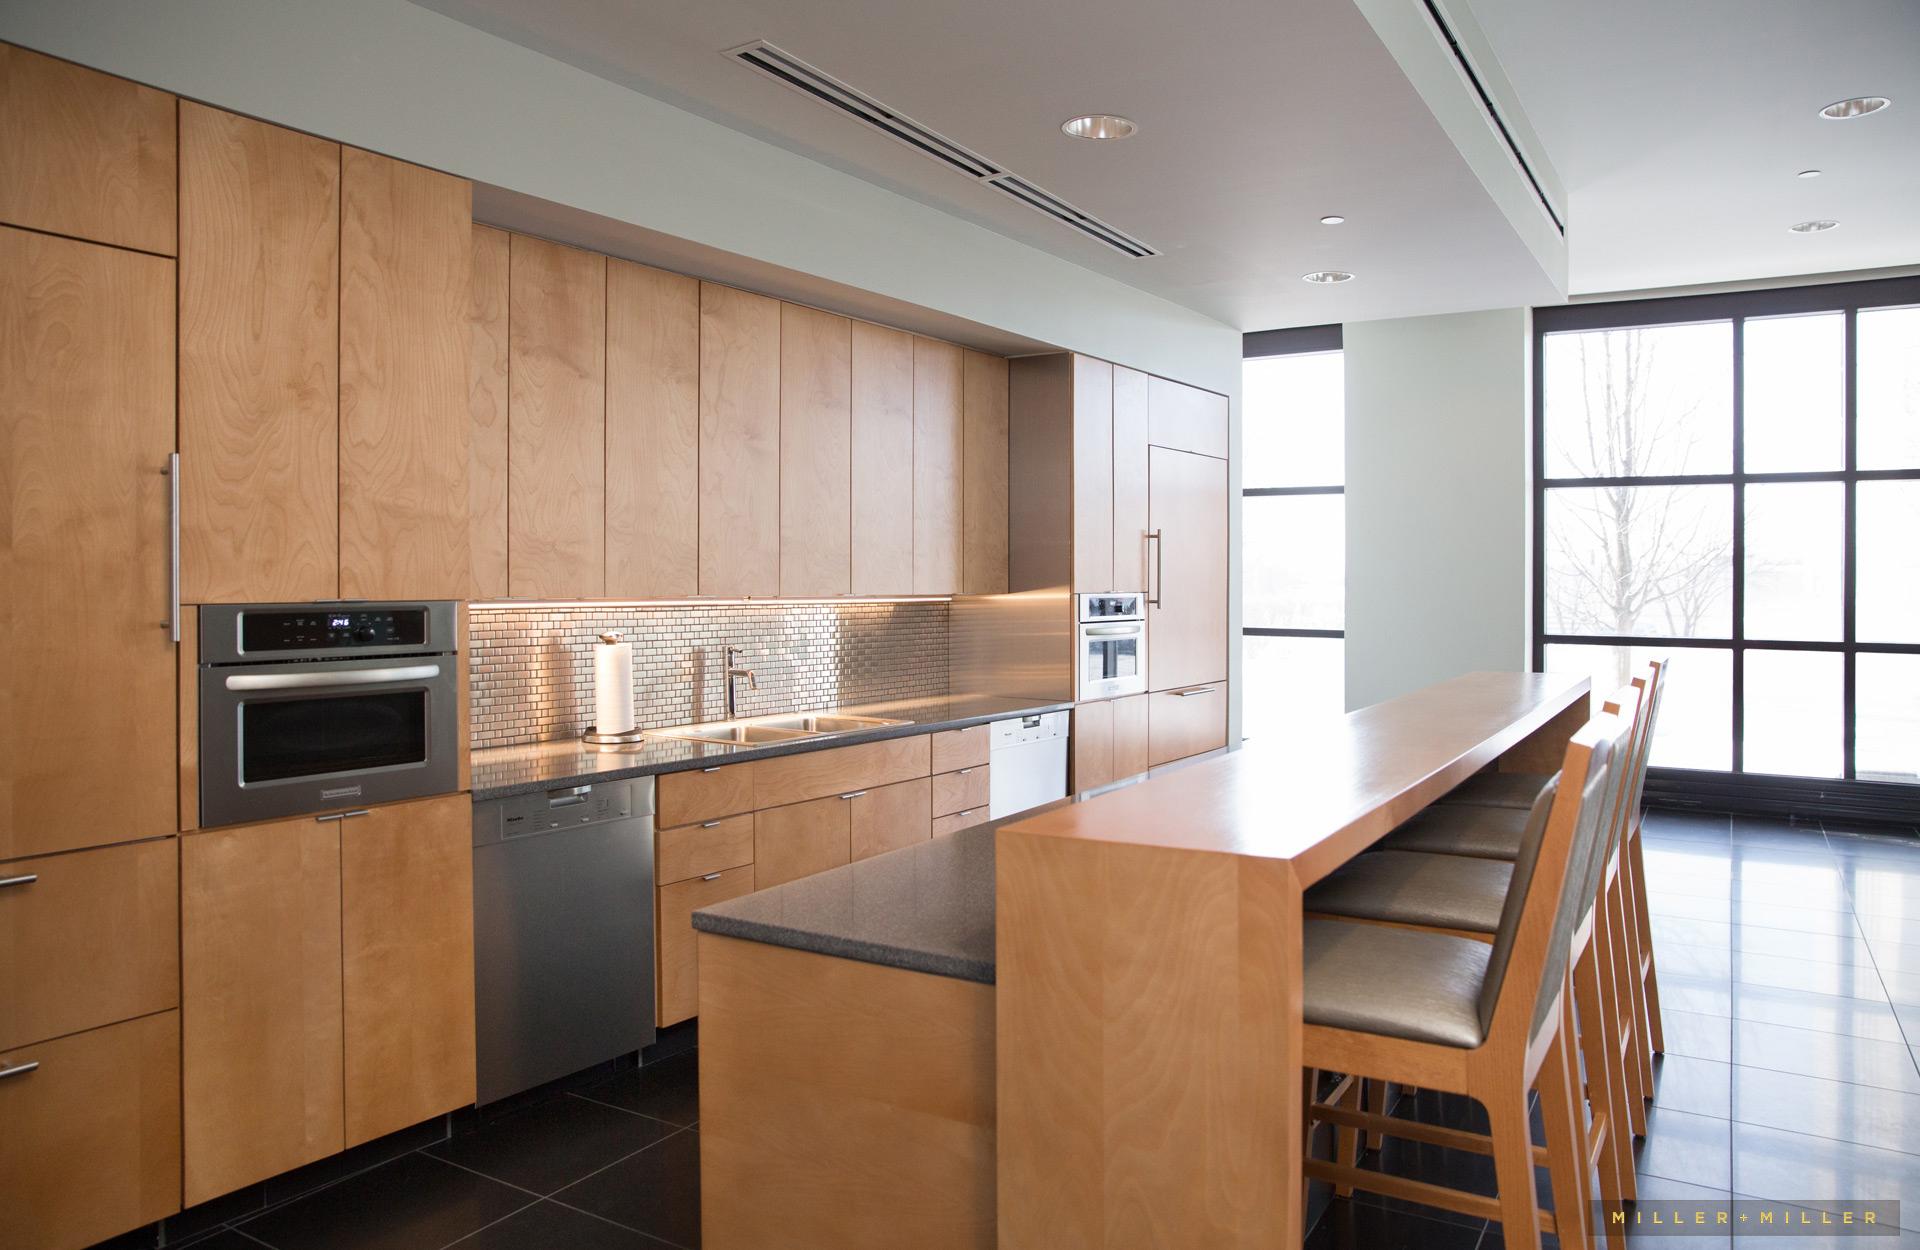 High-end commercial kitchen breakroom